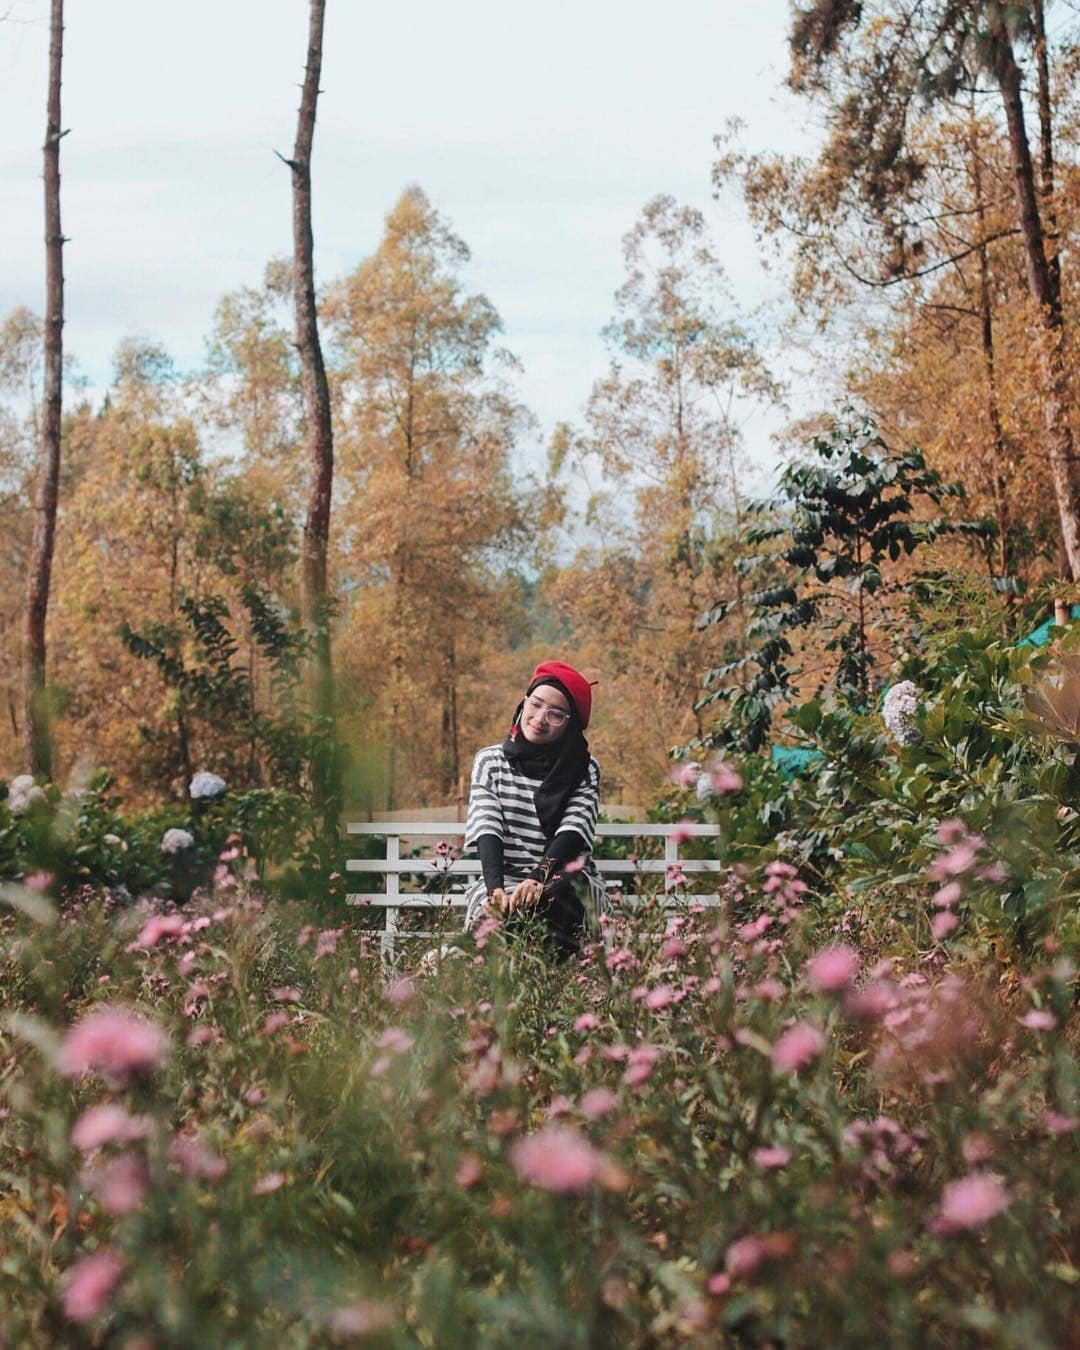 Instageniknya Taman Bunga yang Romantis, Malang, Malang Raya, Dolan Dolen, Dolaners Instageniknya Taman Bunga yang Romantis by novanirza - Dolan Dolen